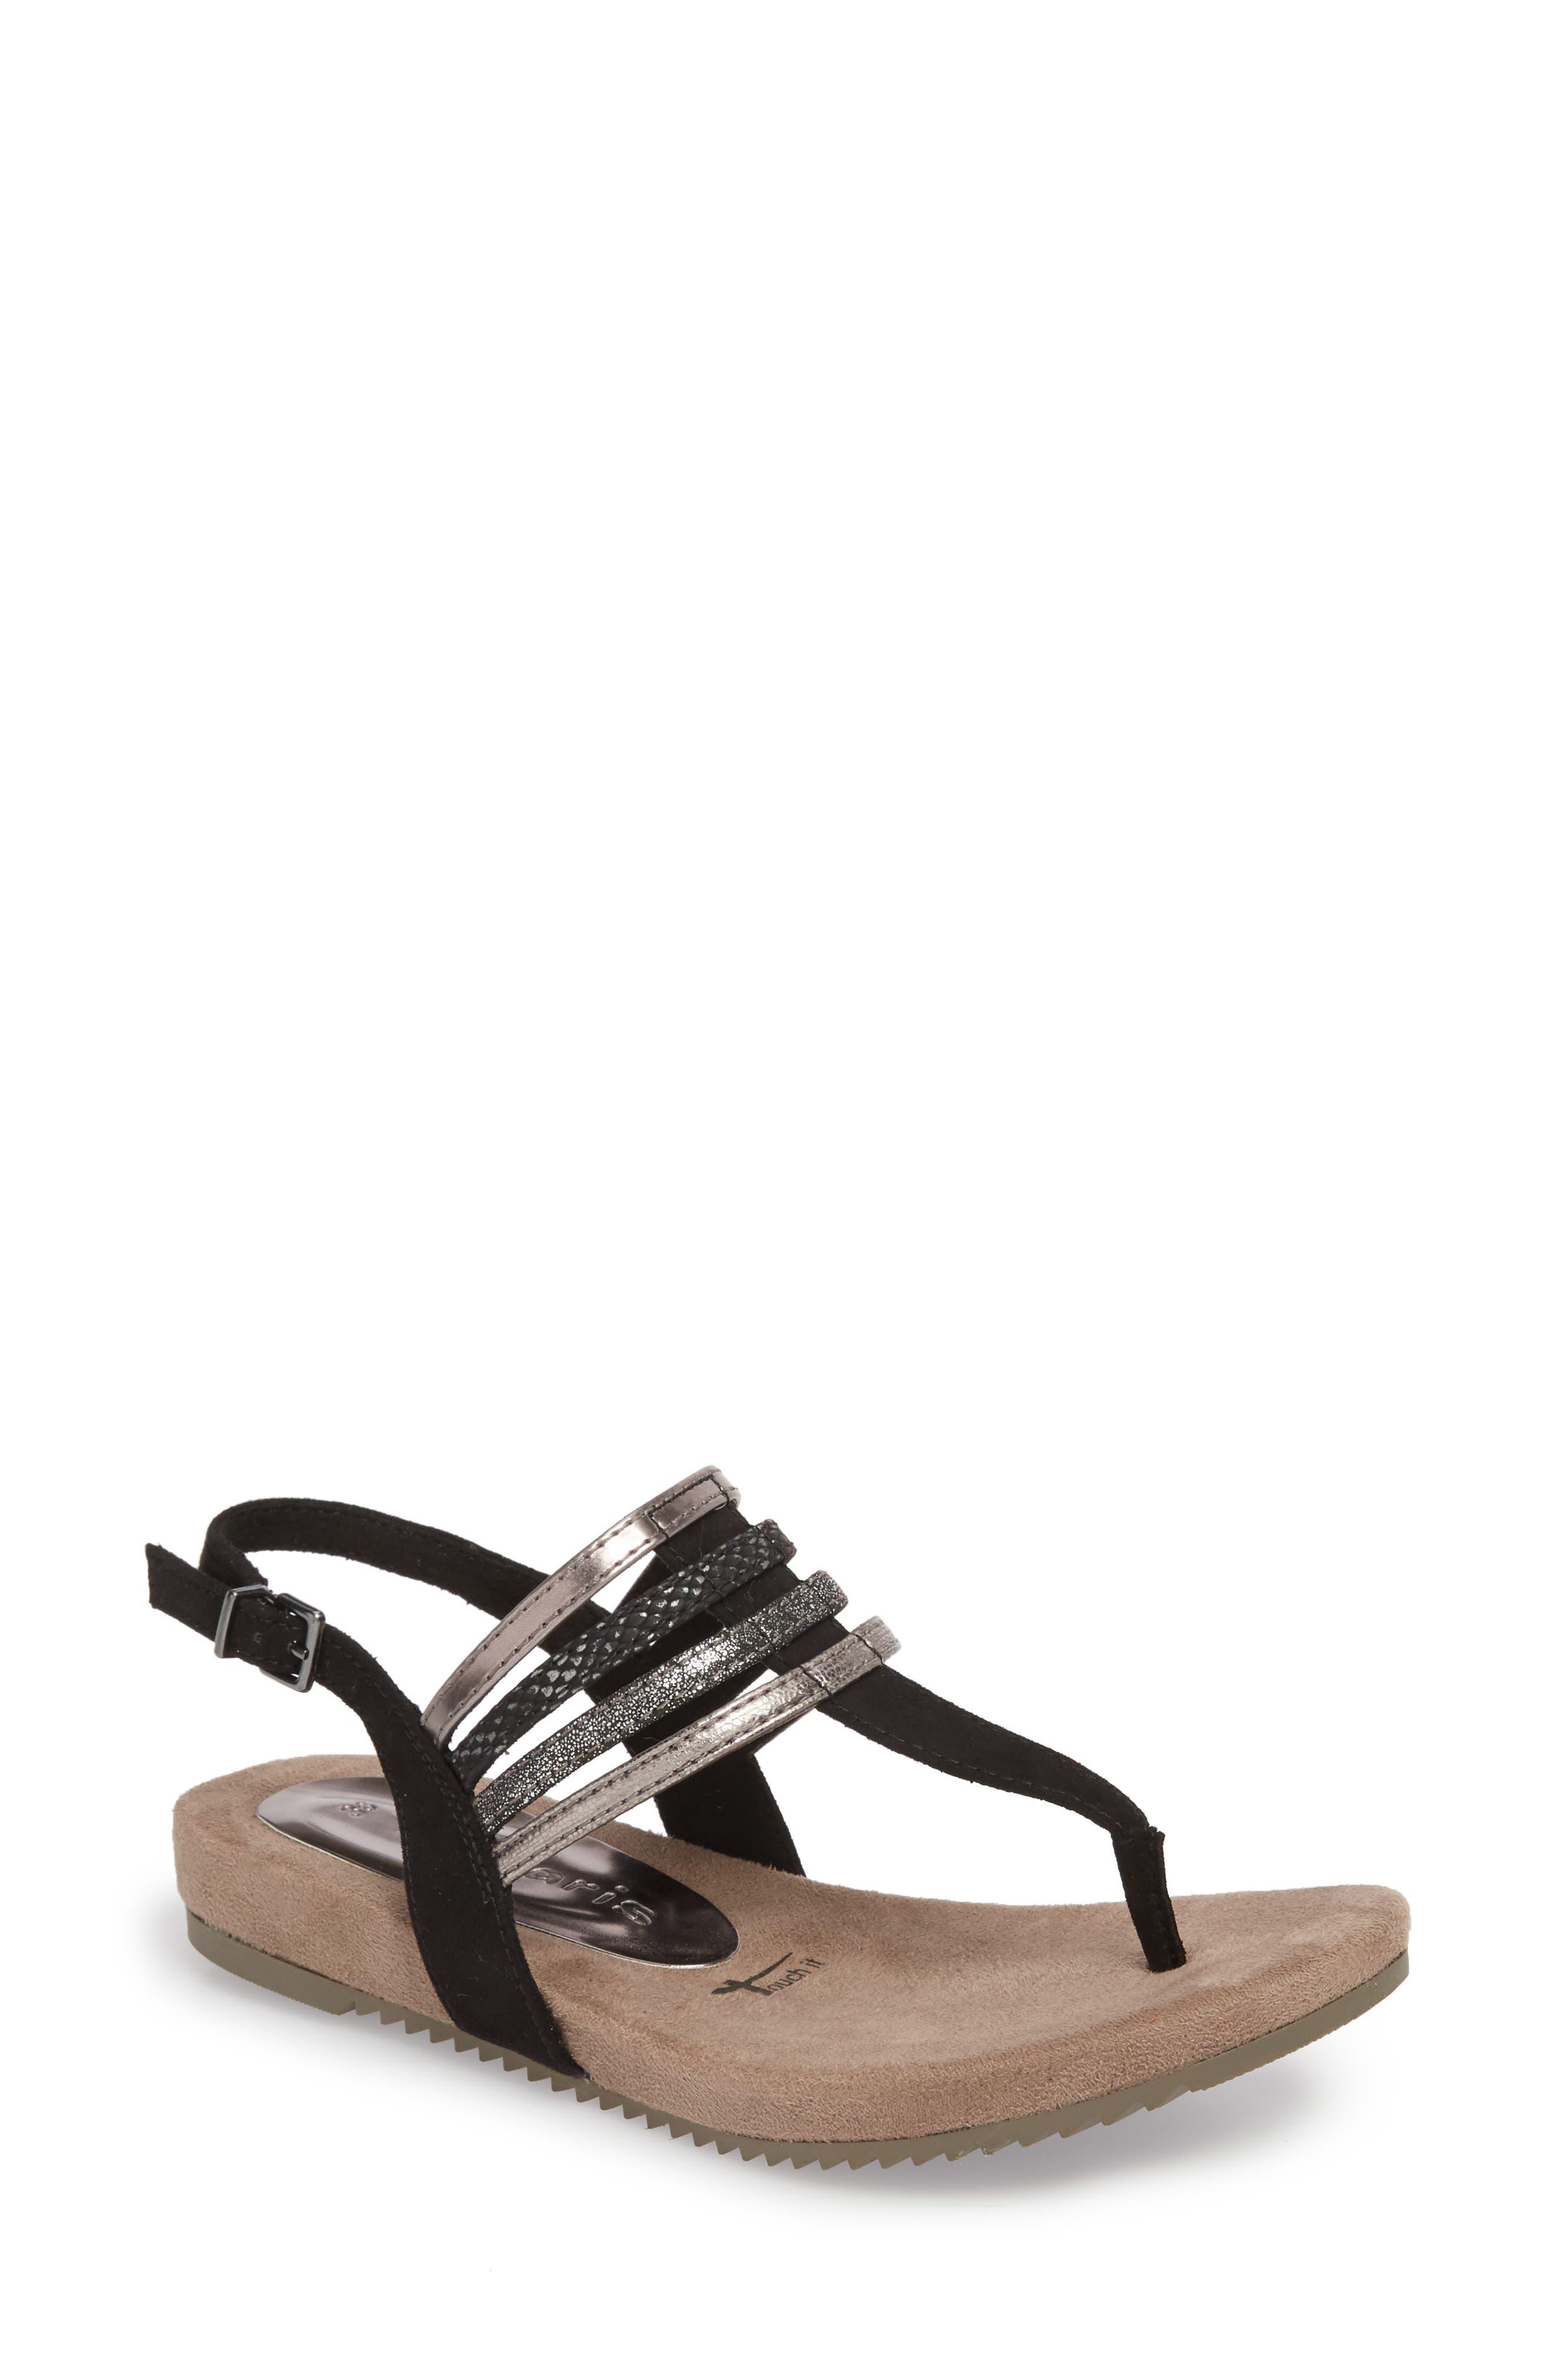 Locust Sandal,                         Main,                         color, Black Fabric